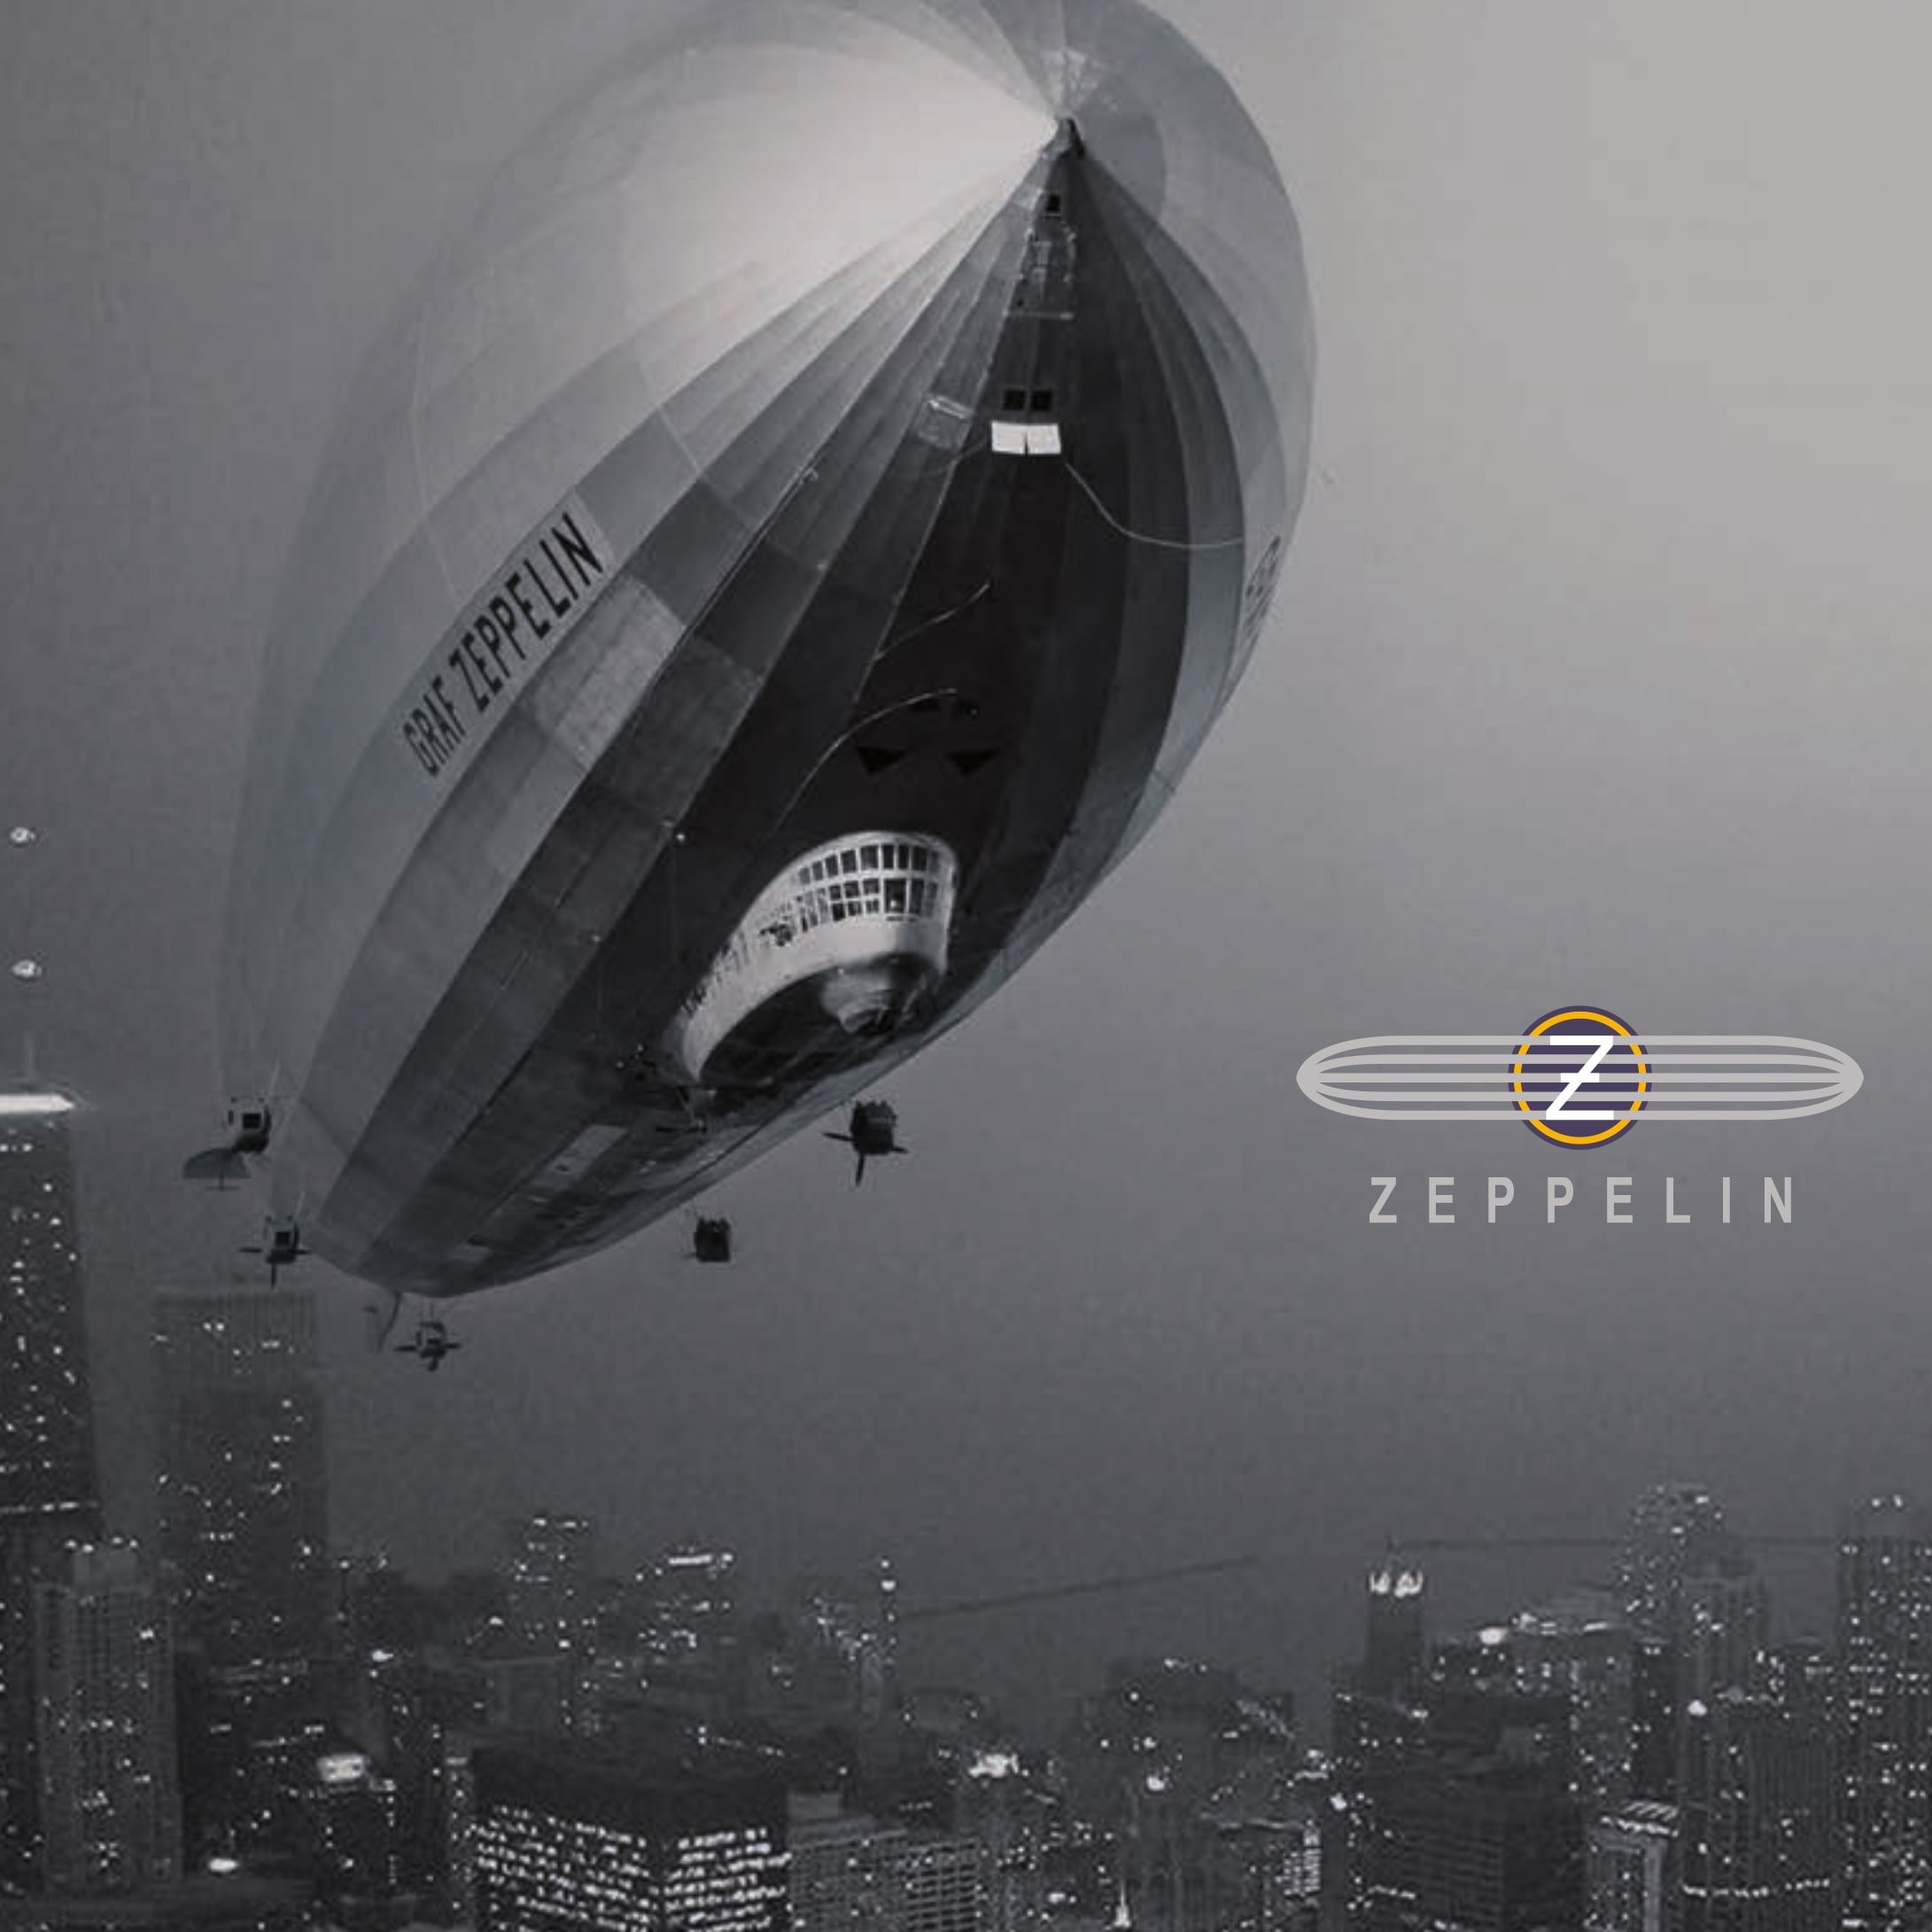 Zegarki Zeppelin